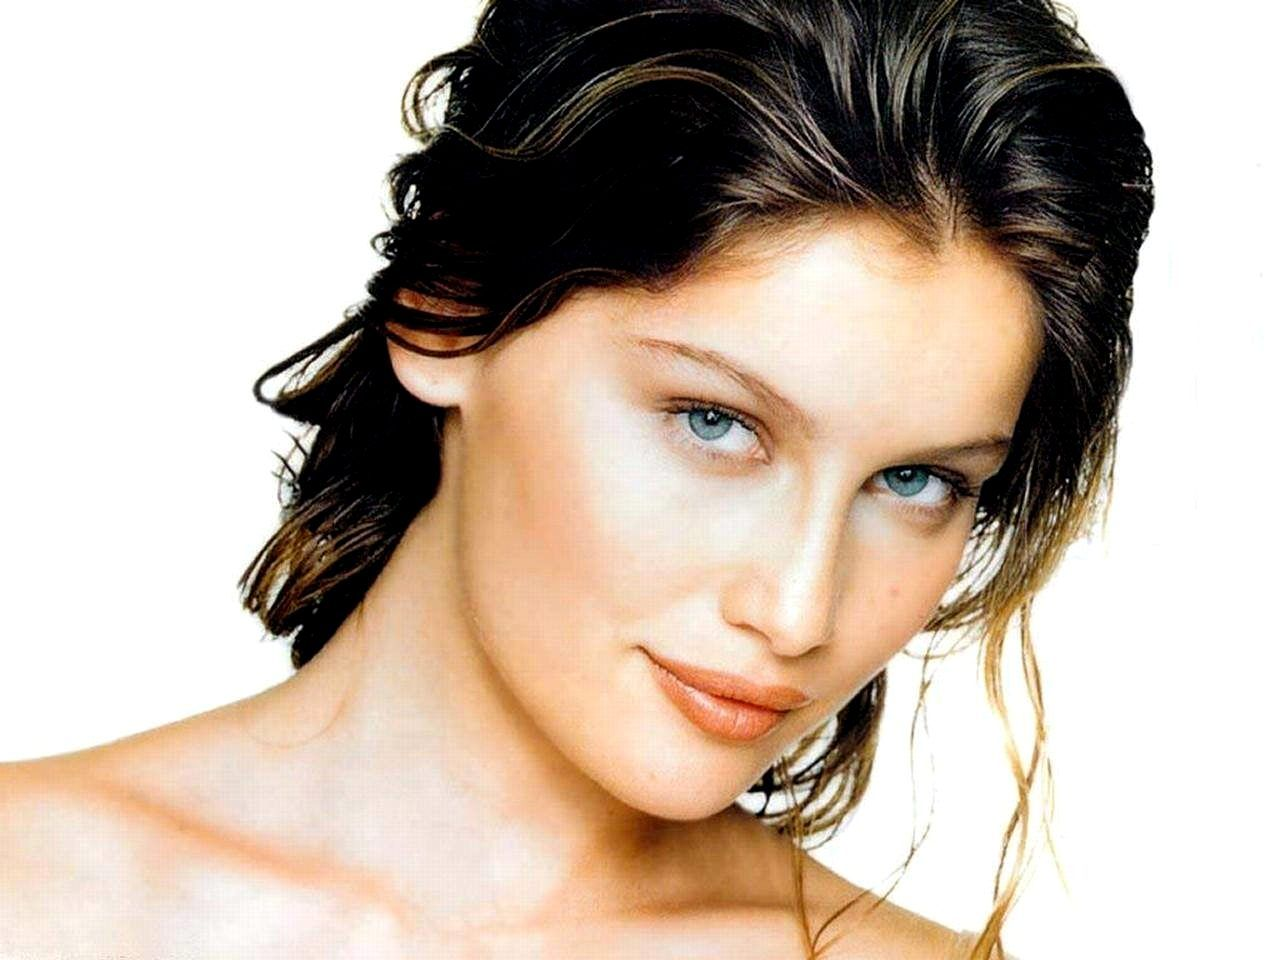 Ana Paula Arosio Sexo 7 french women's beauty secrets | french beauty secrets